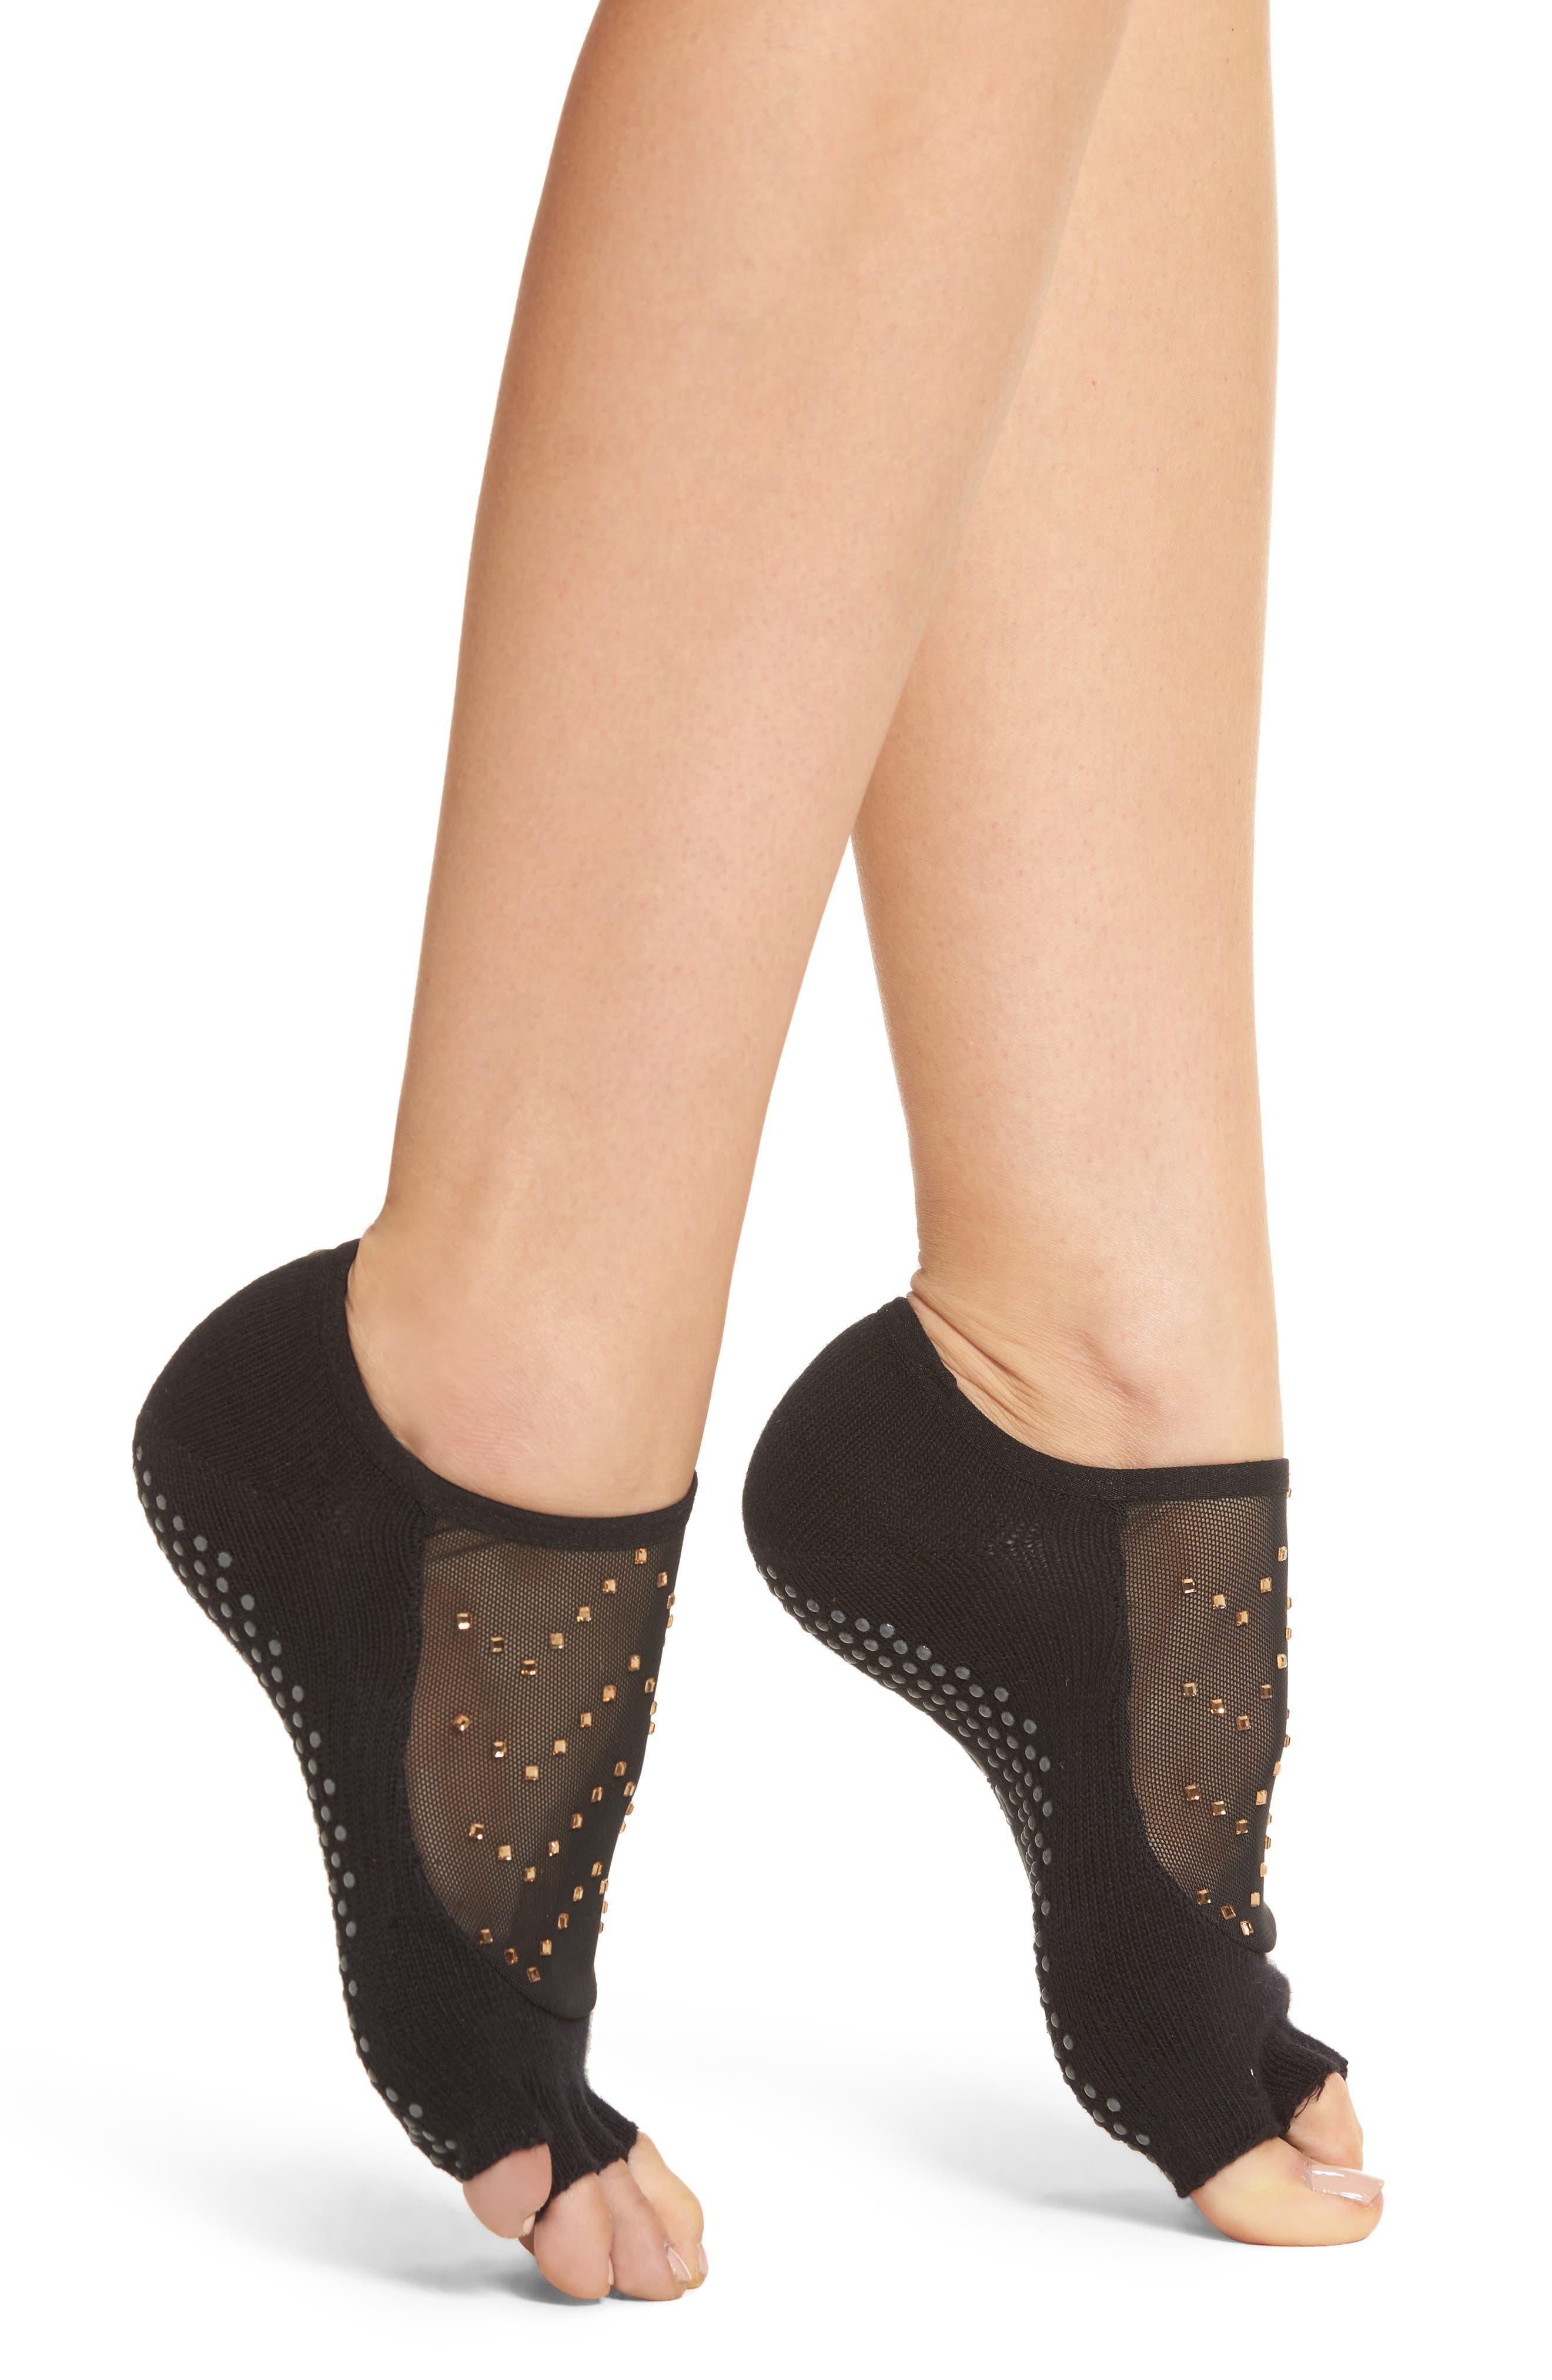 Luna Half Toe Gripper Socks,                             Main thumbnail 1, color,                             Twilight